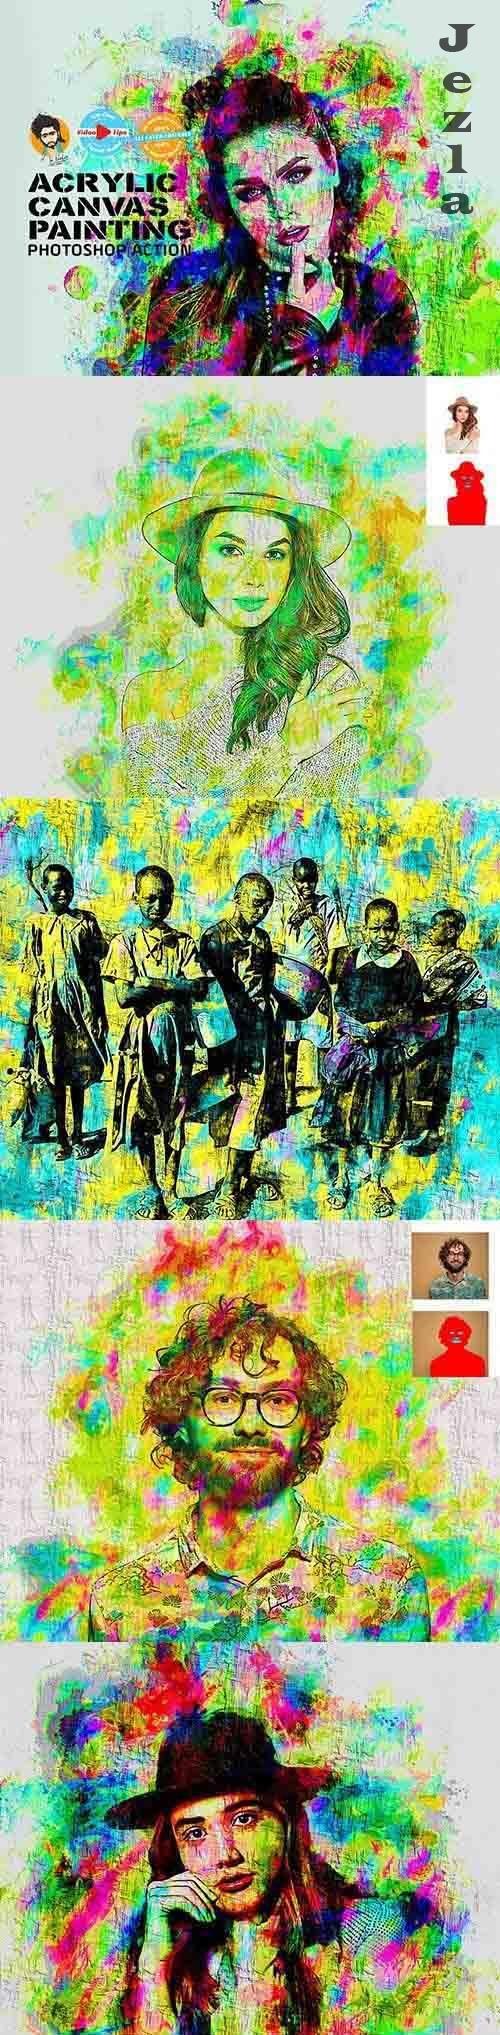 CreativeMarket - Acrylic Canvas Painting 5990448